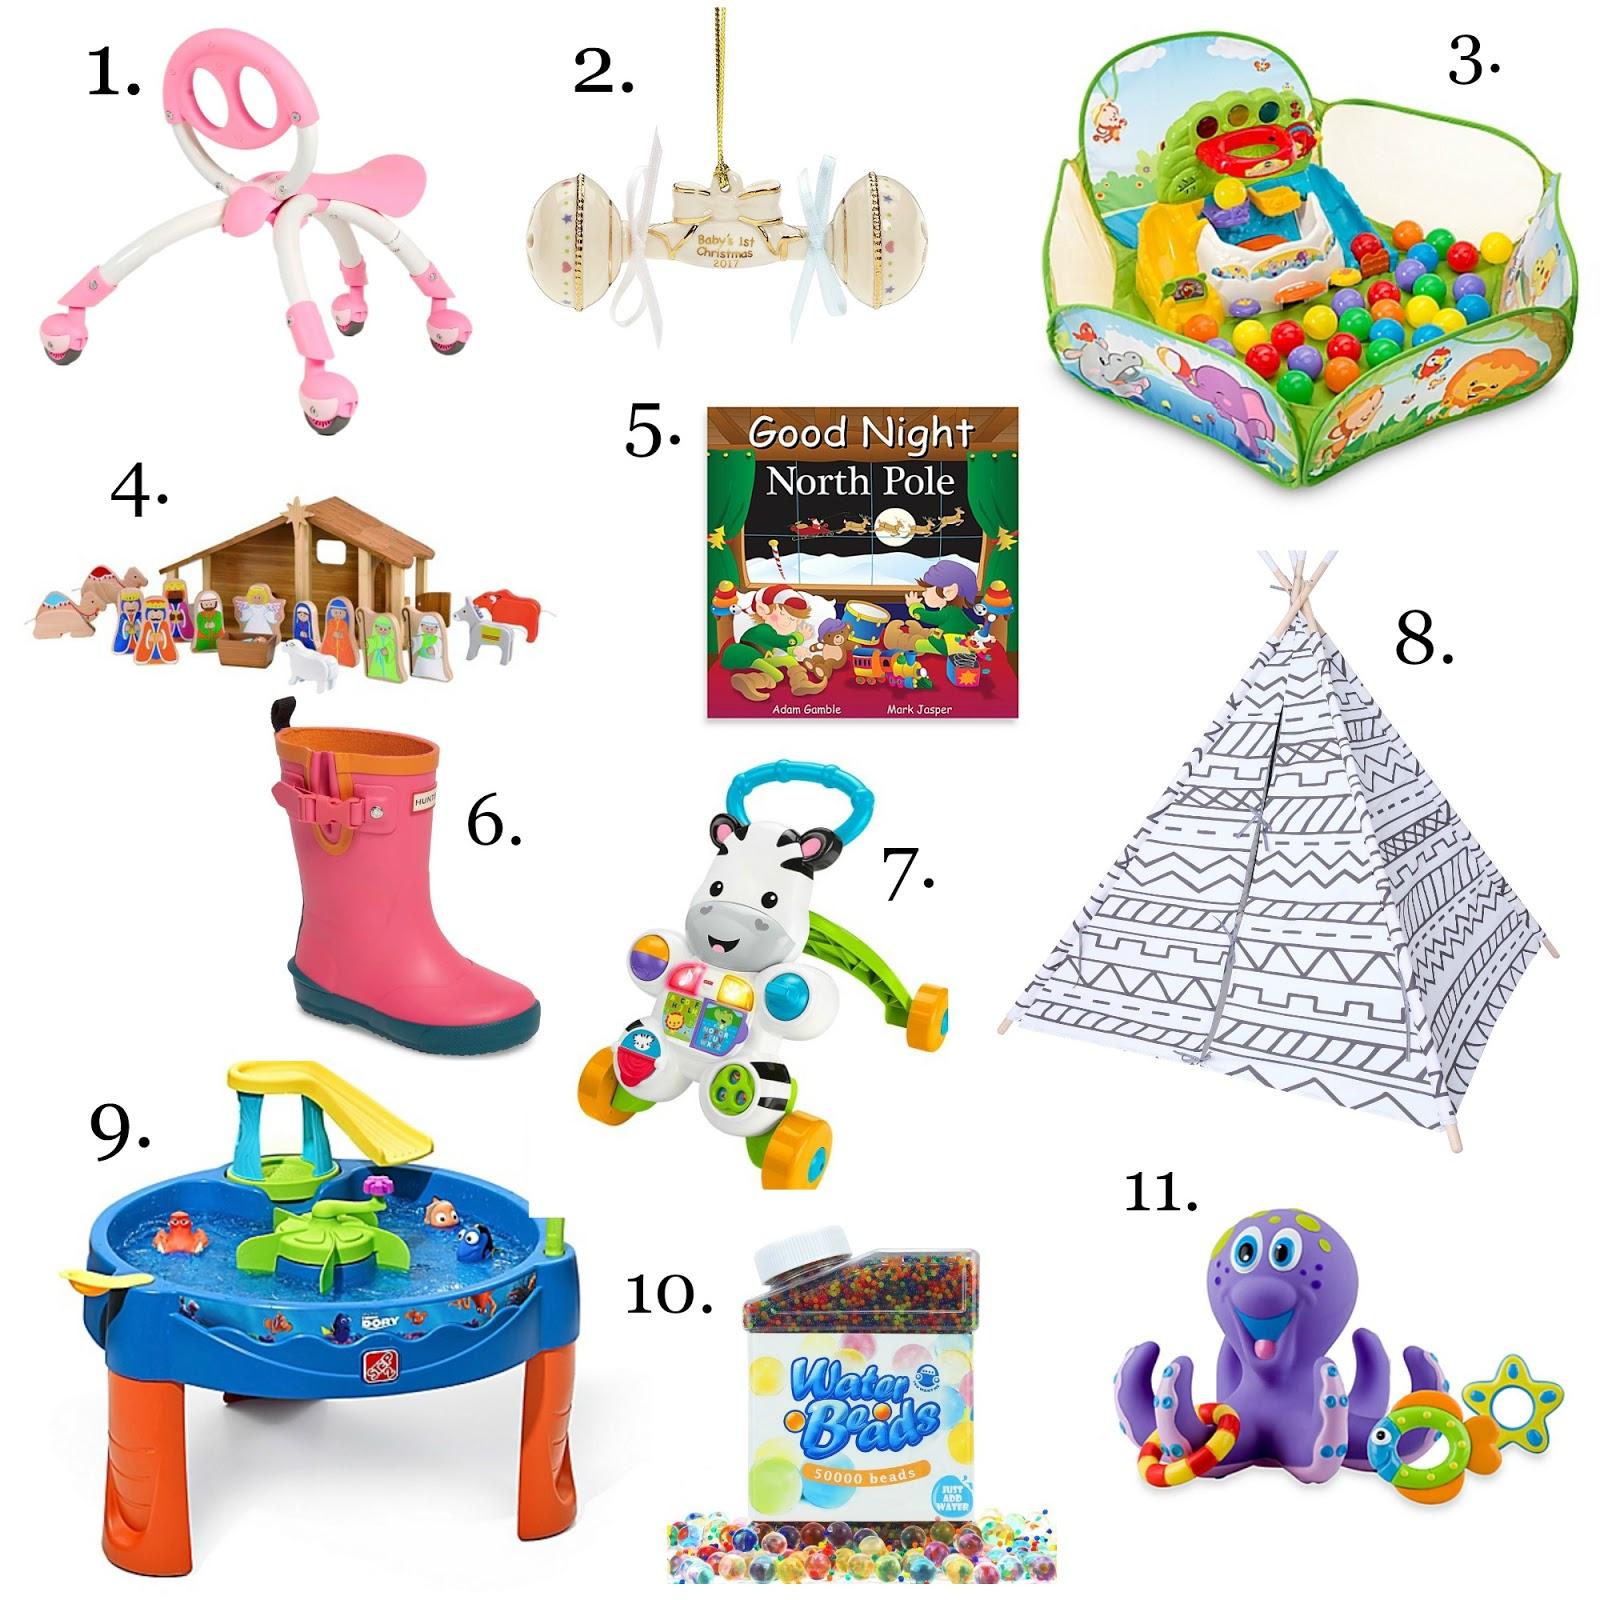 Davis Duo: Christmas gift guide for kids